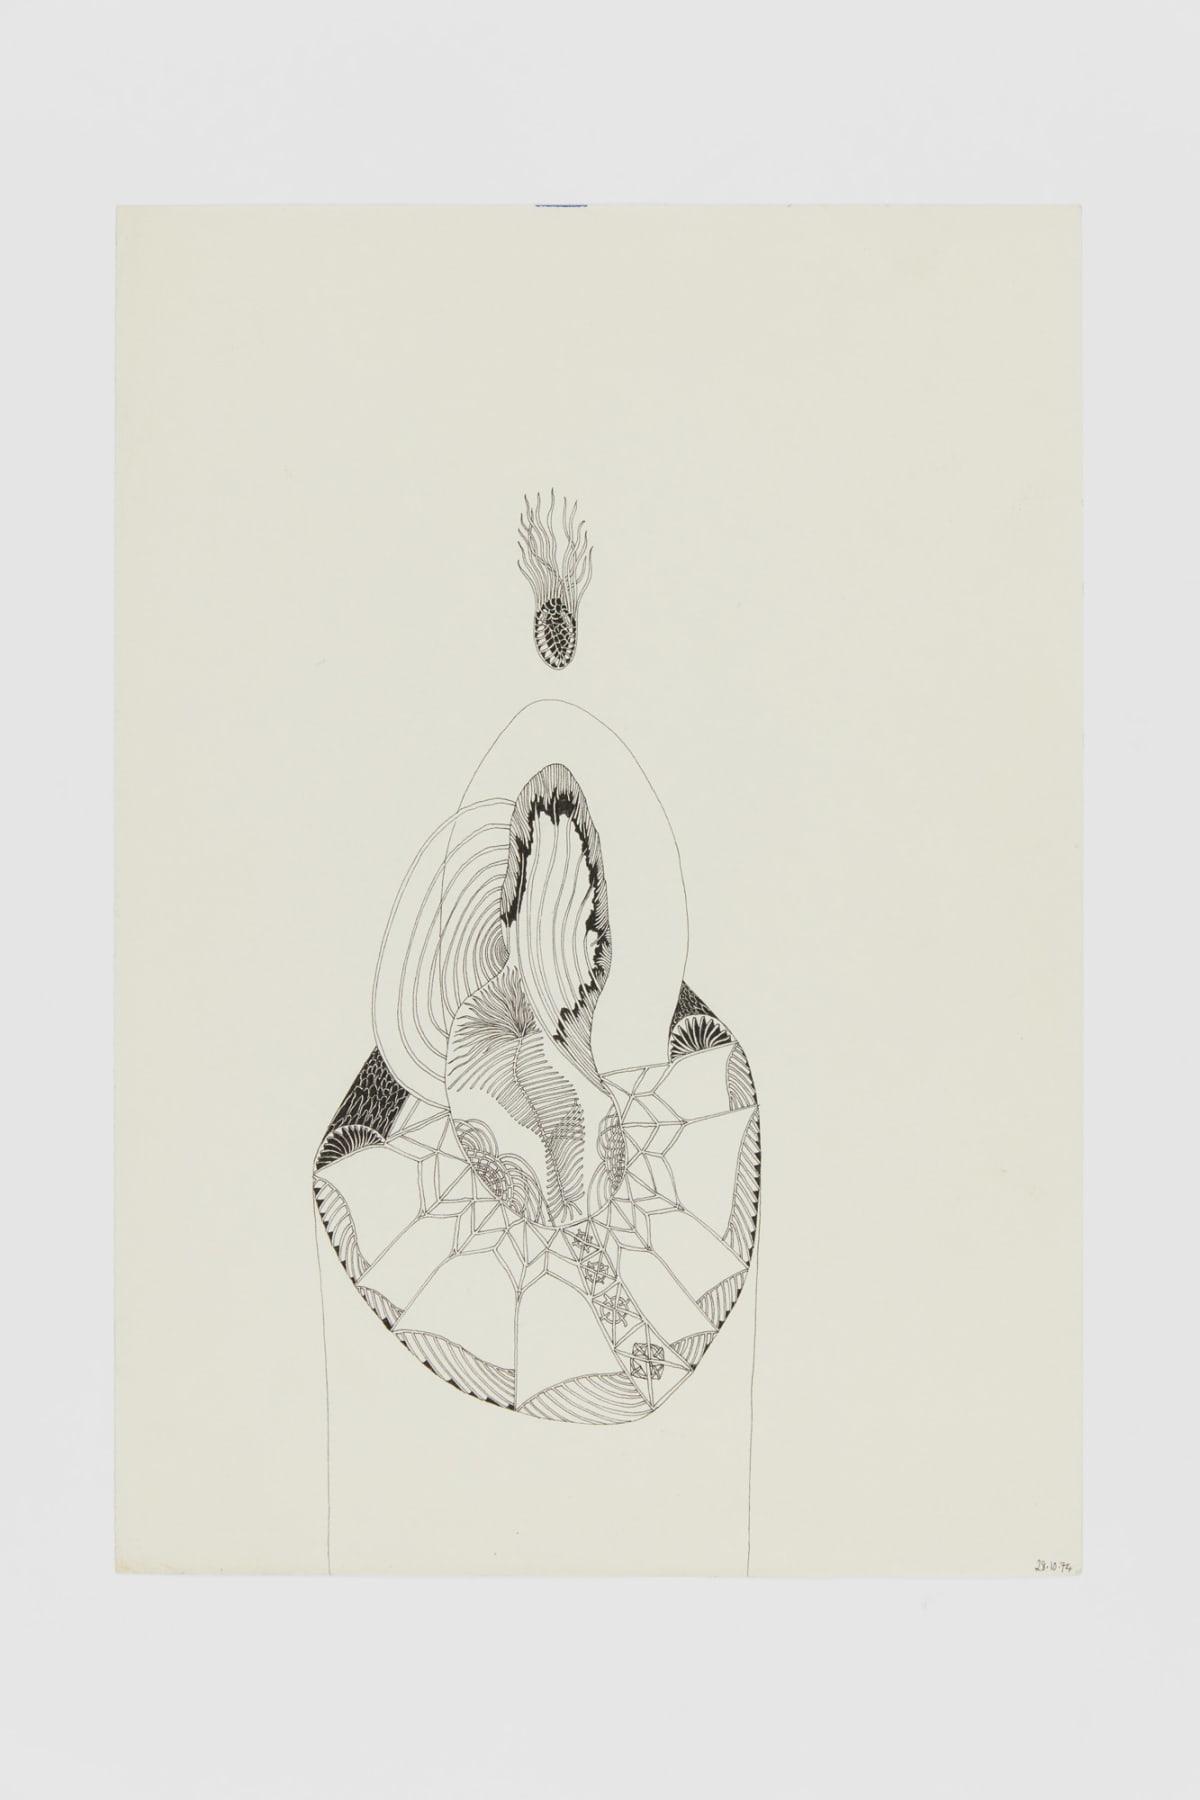 Ann CHURCHILL 28.10.74 (Daily drawing), 1974 Pen on paper 29.7 x 20.9 cm